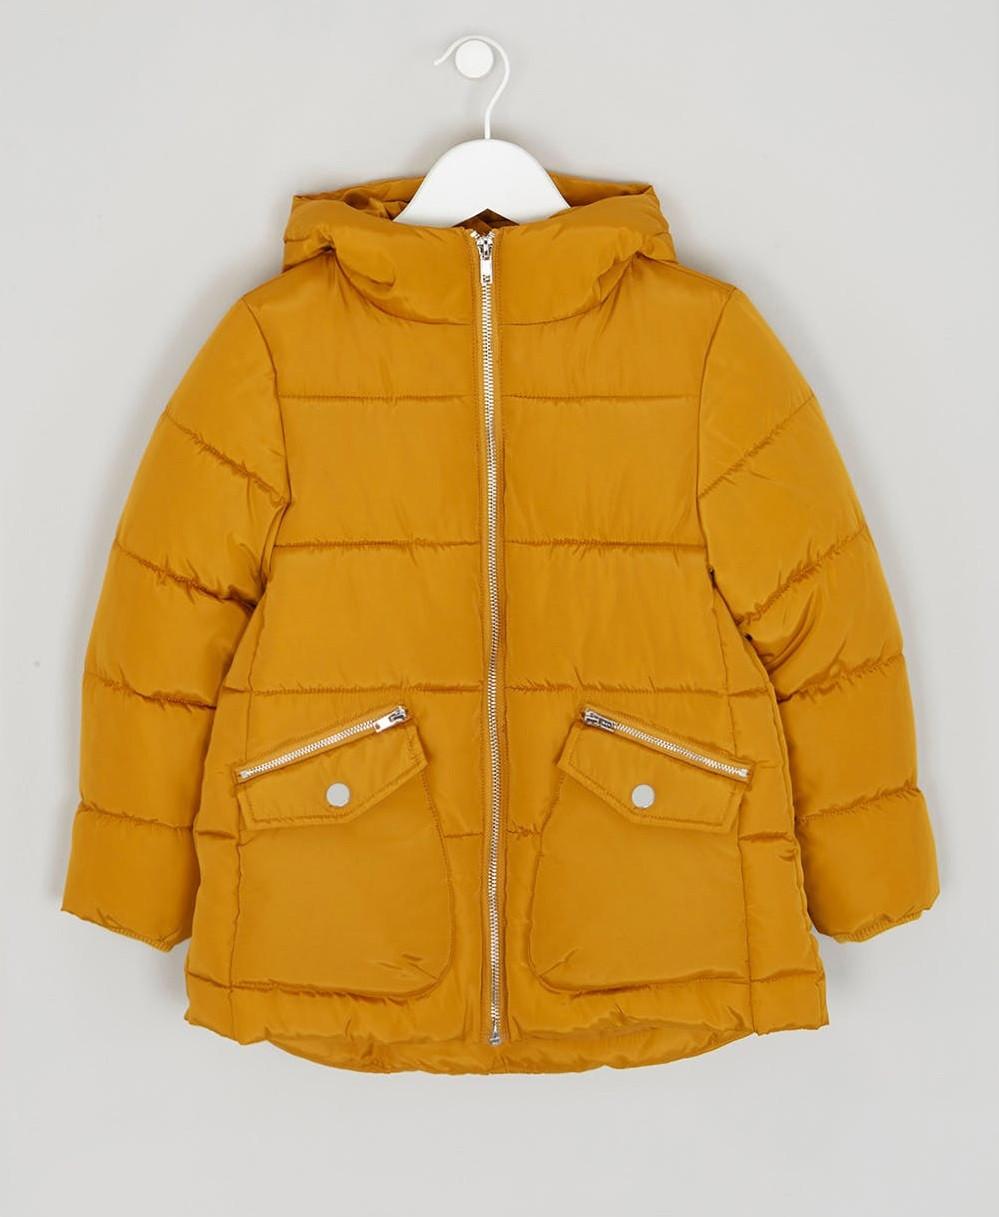 Демисезонная куртка для девочки охра Matalan Англия Размер 128, 134